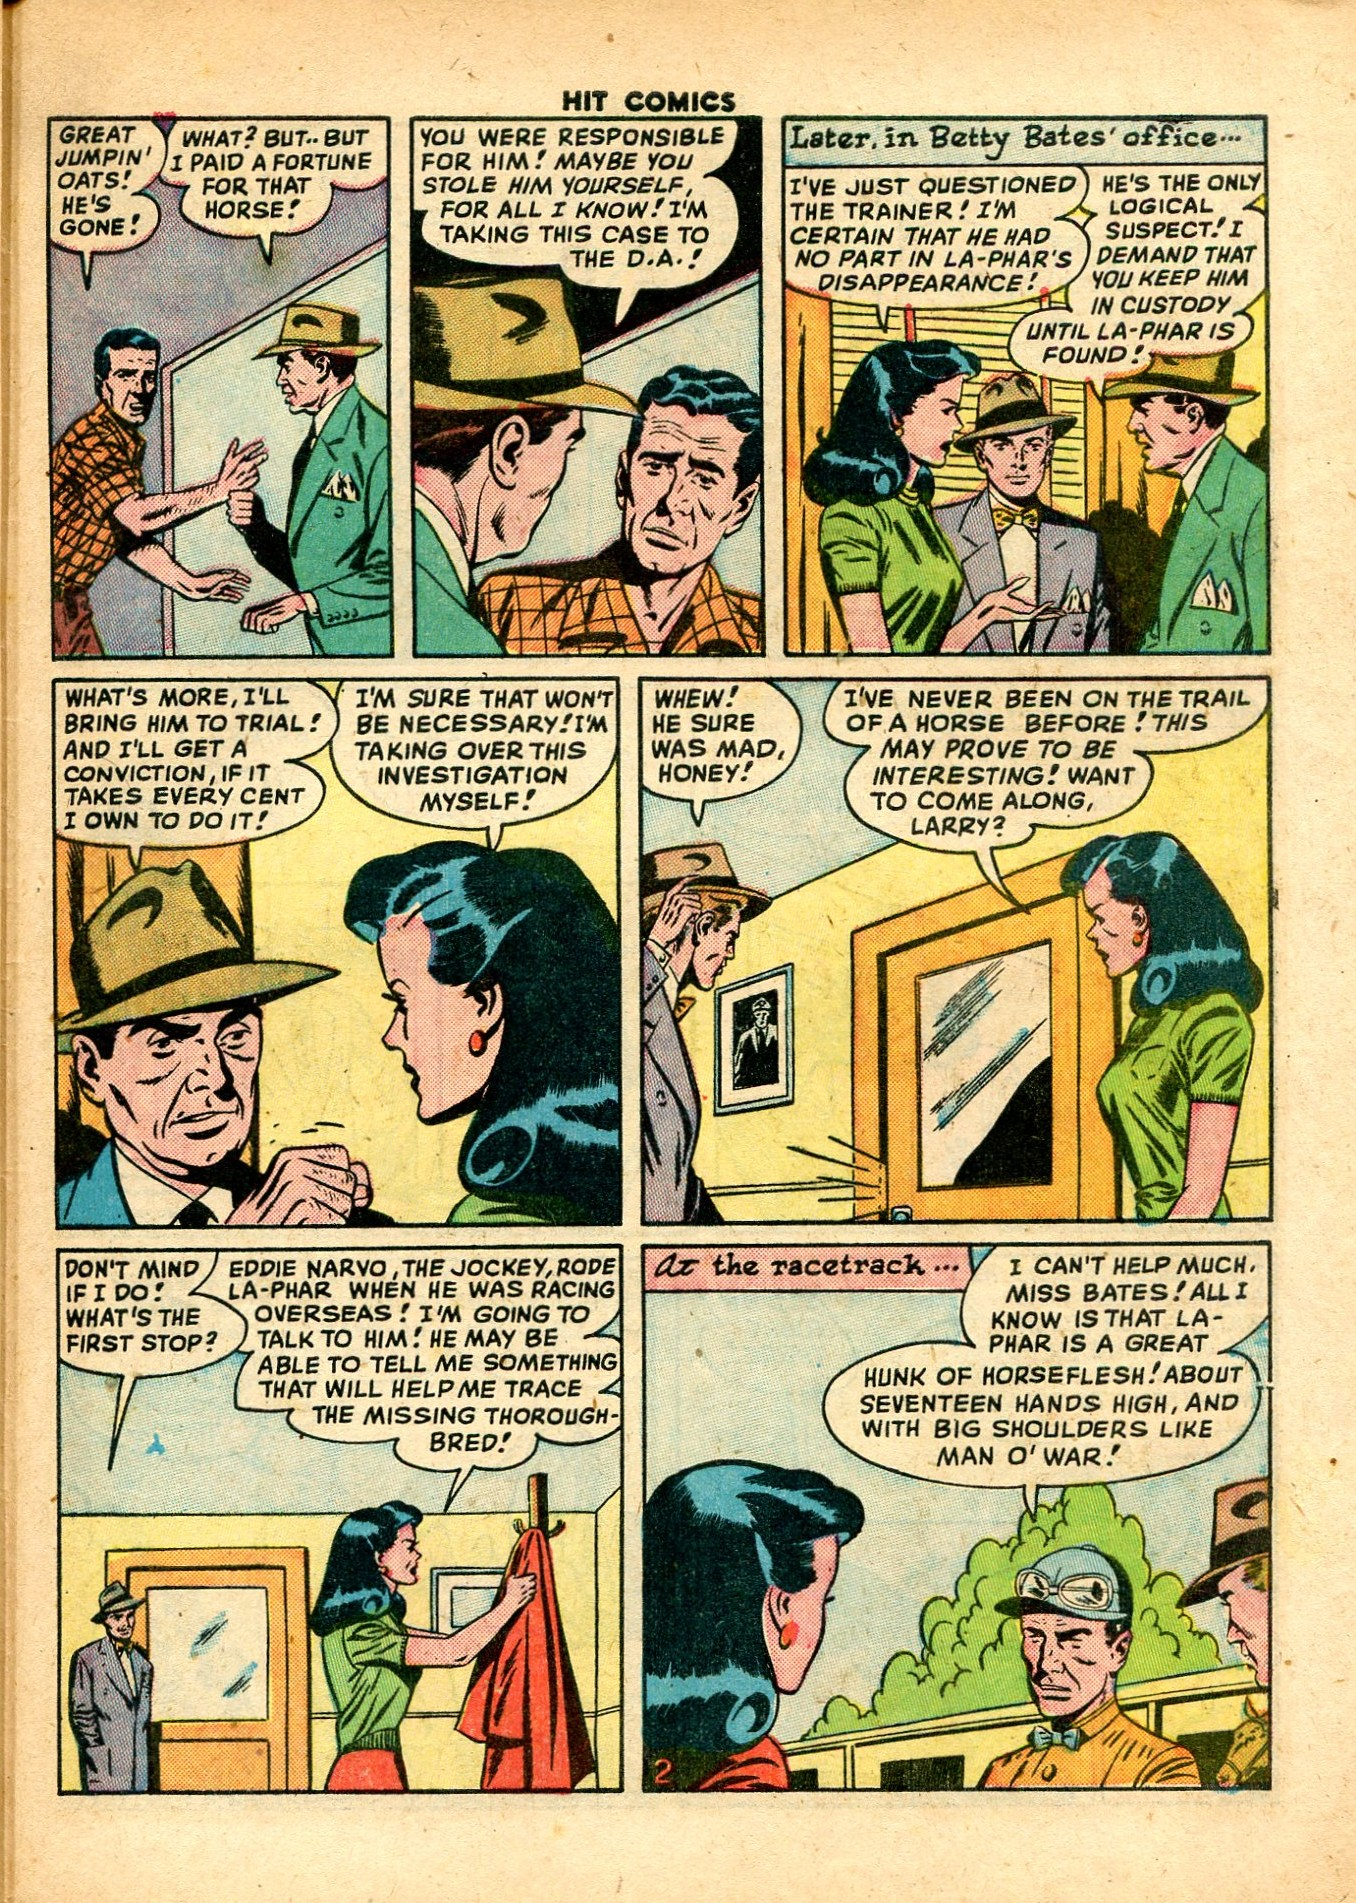 Read online Hit Comics comic -  Issue #59 - 29